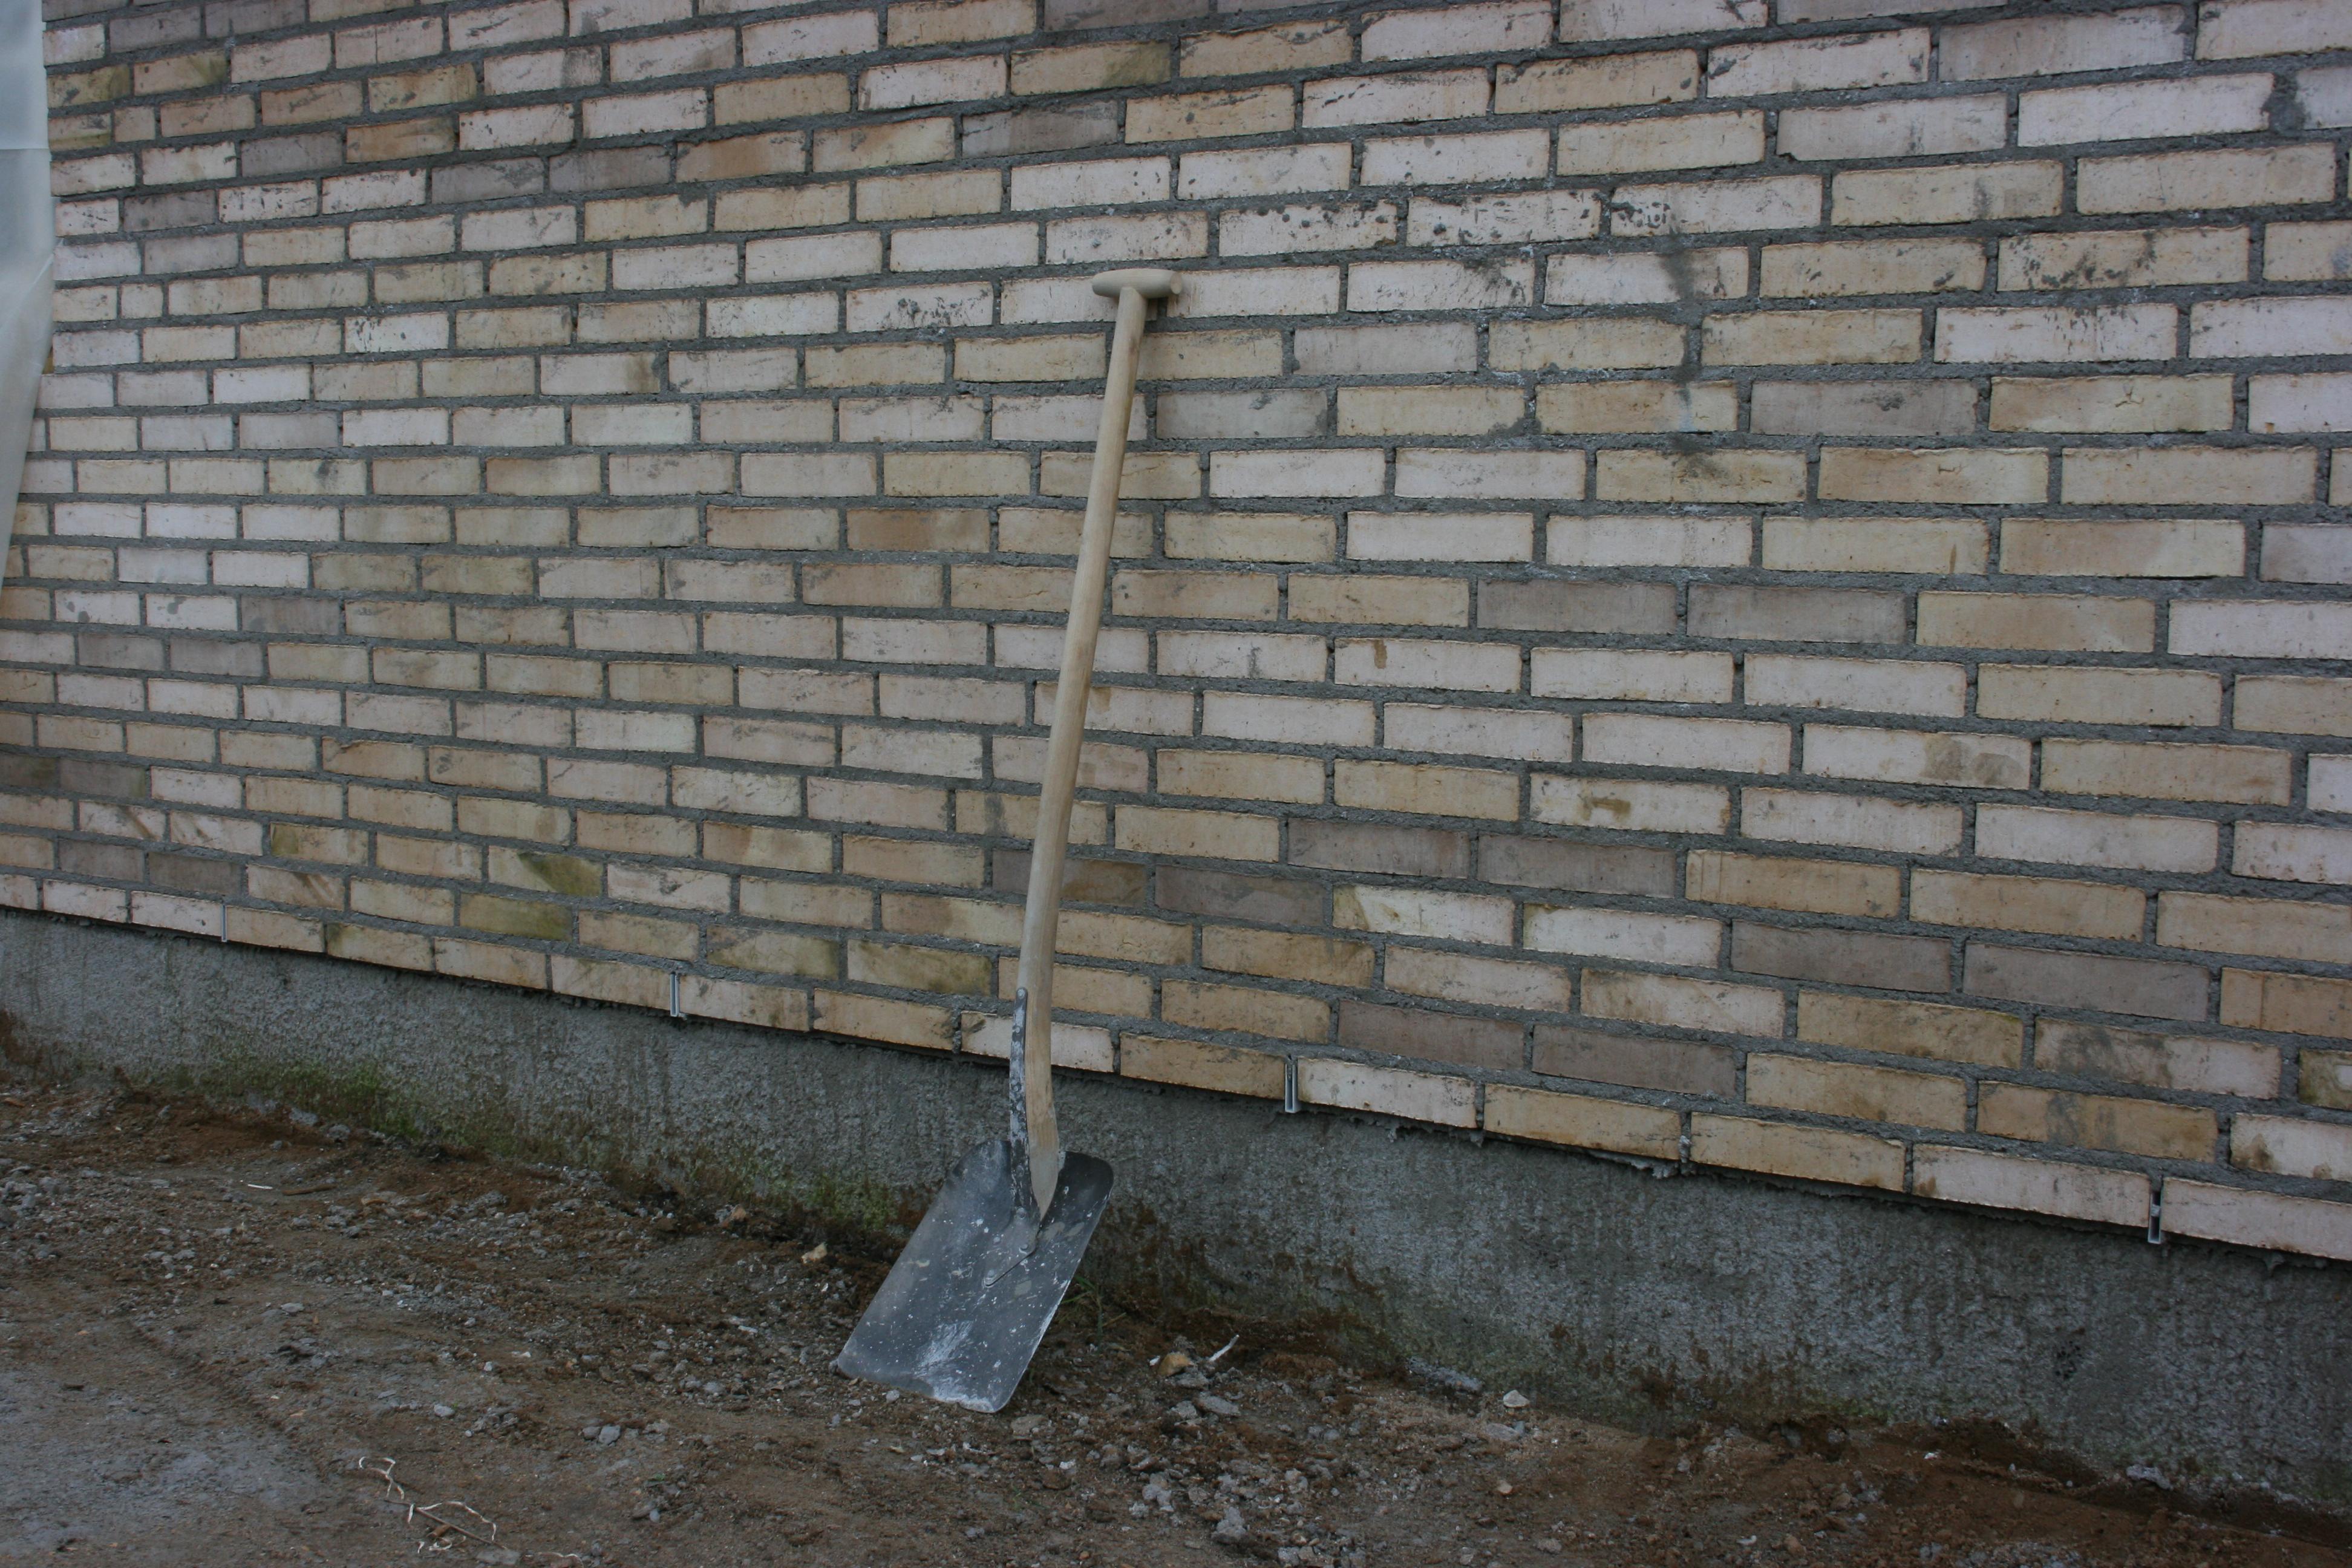 murertilbud murer mursten